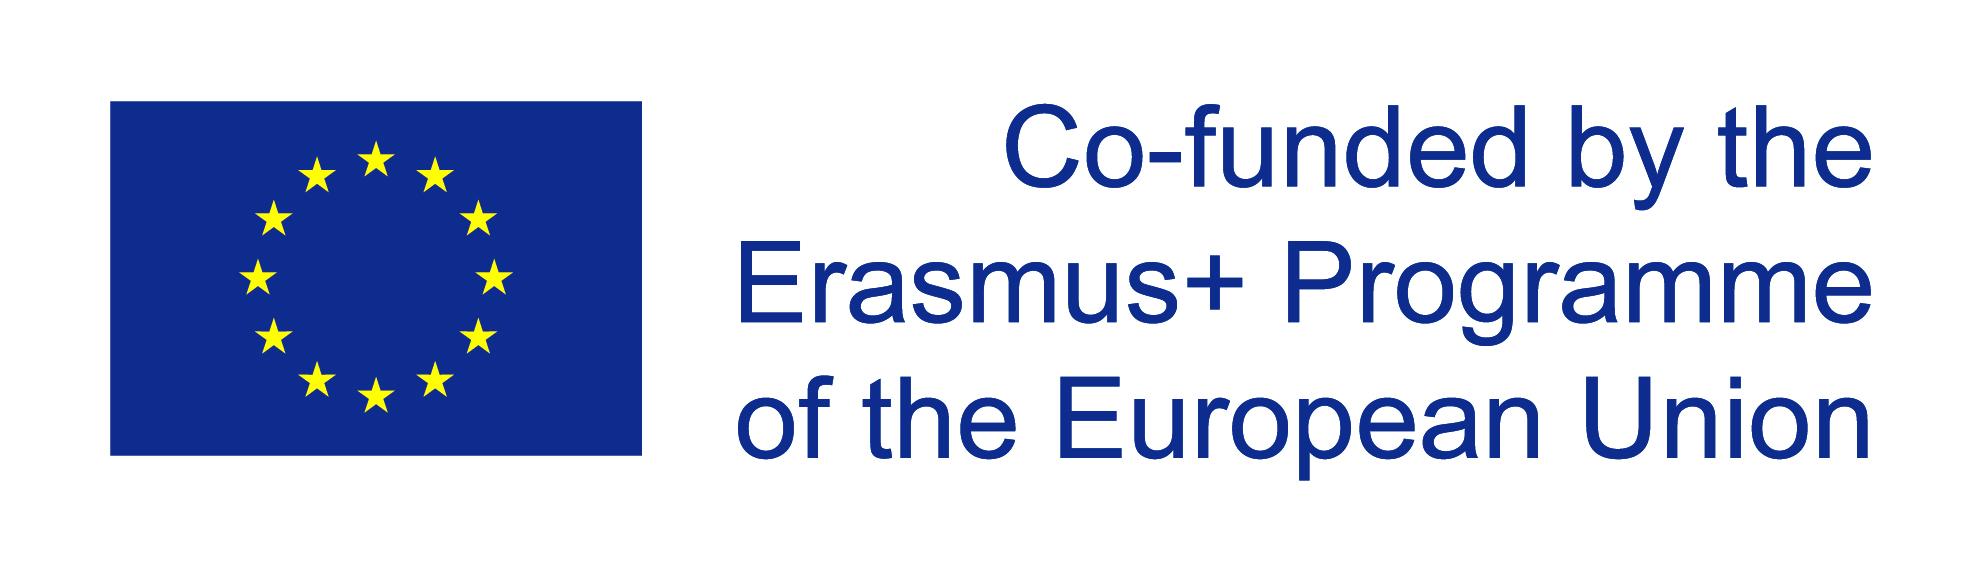 eu flag co funded re Erasmusplus